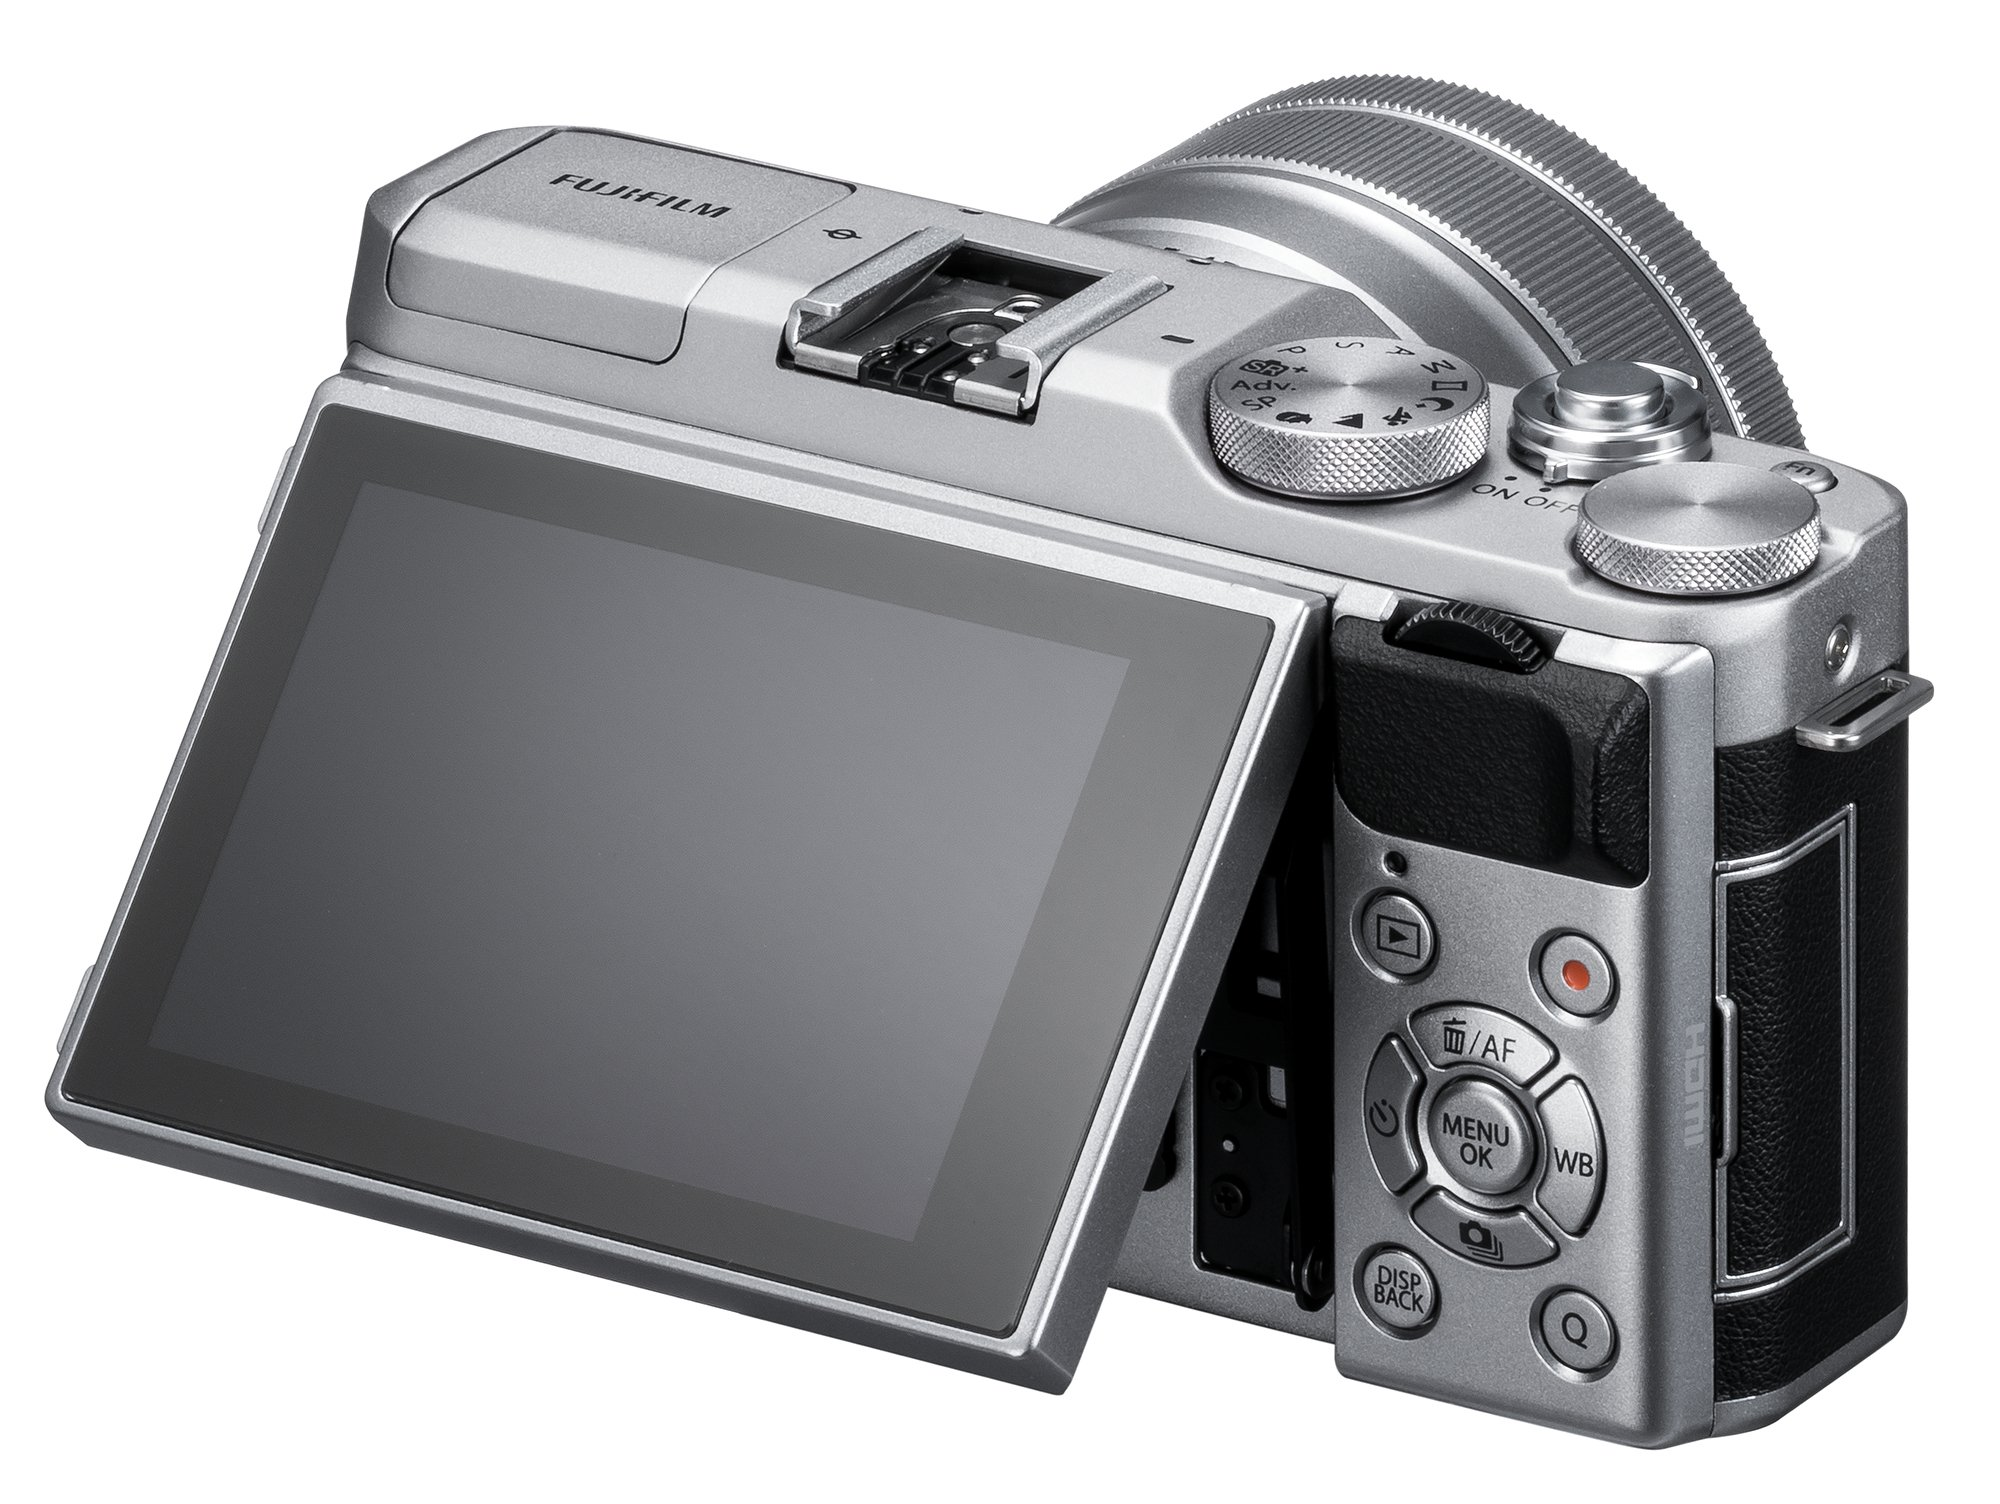 Fujifilm X-A5 Mirrorless Digital Camera w/XC15-45mmF3.5-5.6 OIS PZ Lens - Silver by Fujifilm (Image #4)